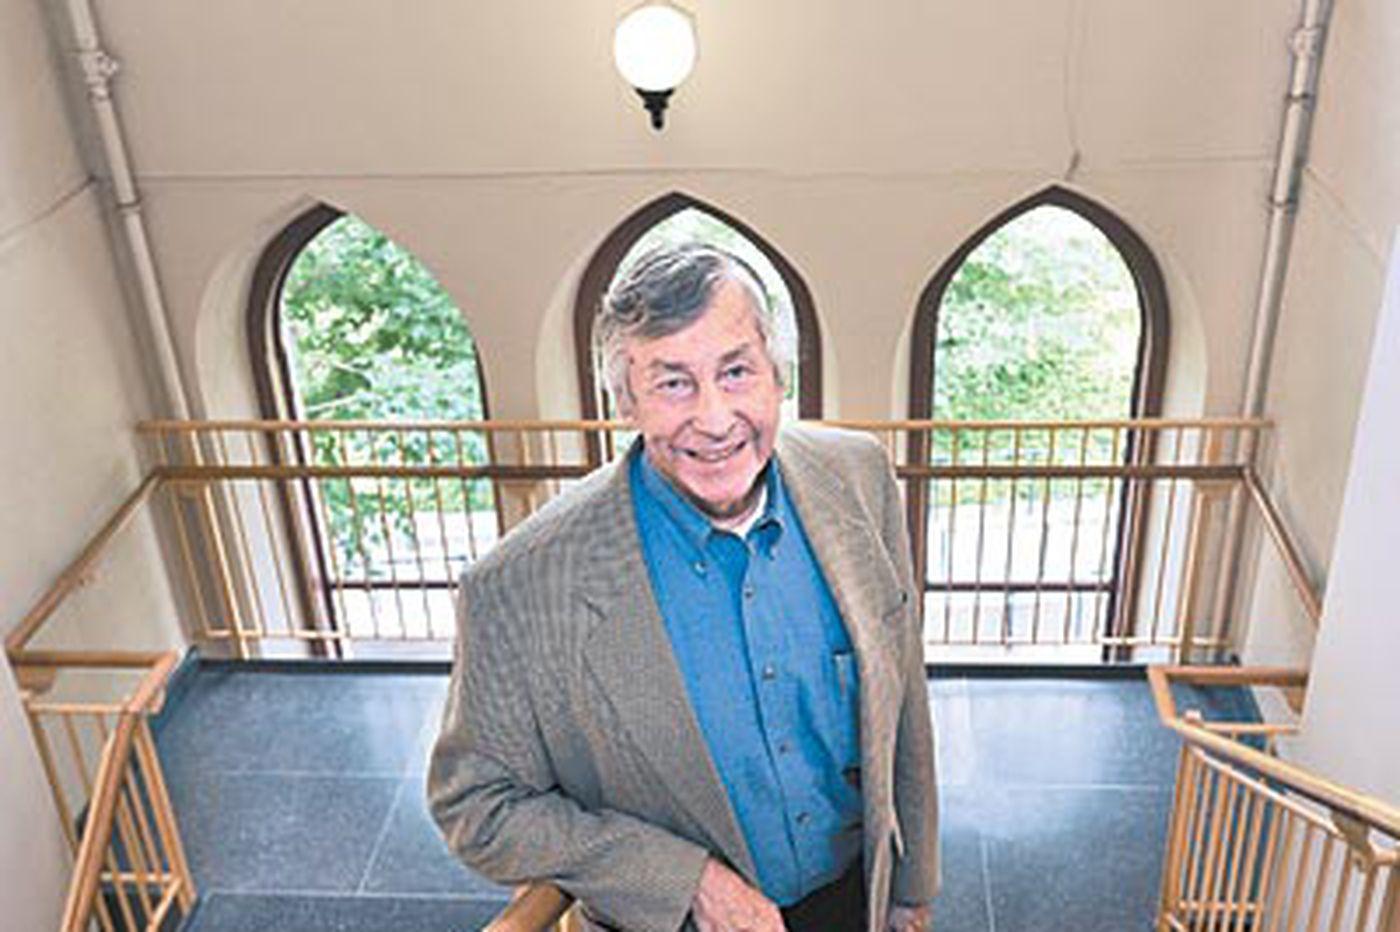 Former university president Hackney bows out at Penn